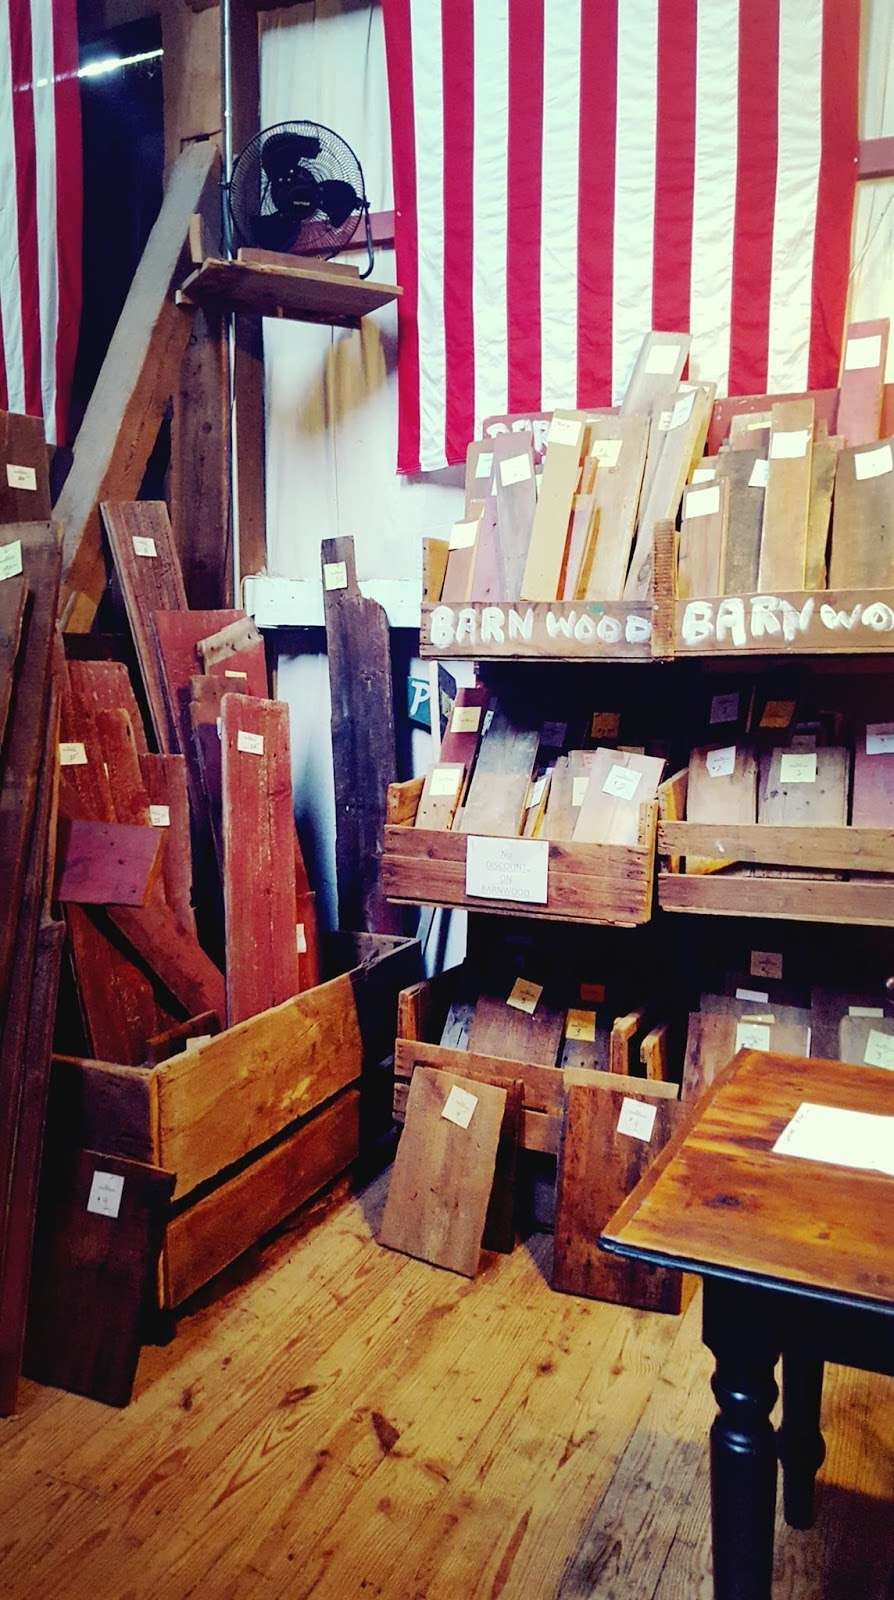 Crickets Antiques & Garden Market - home goods store  | Photo 9 of 10 | Address: 1641 Horseshoe Pike, Glenmoore, PA 19343, USA | Phone: (610) 942-7500